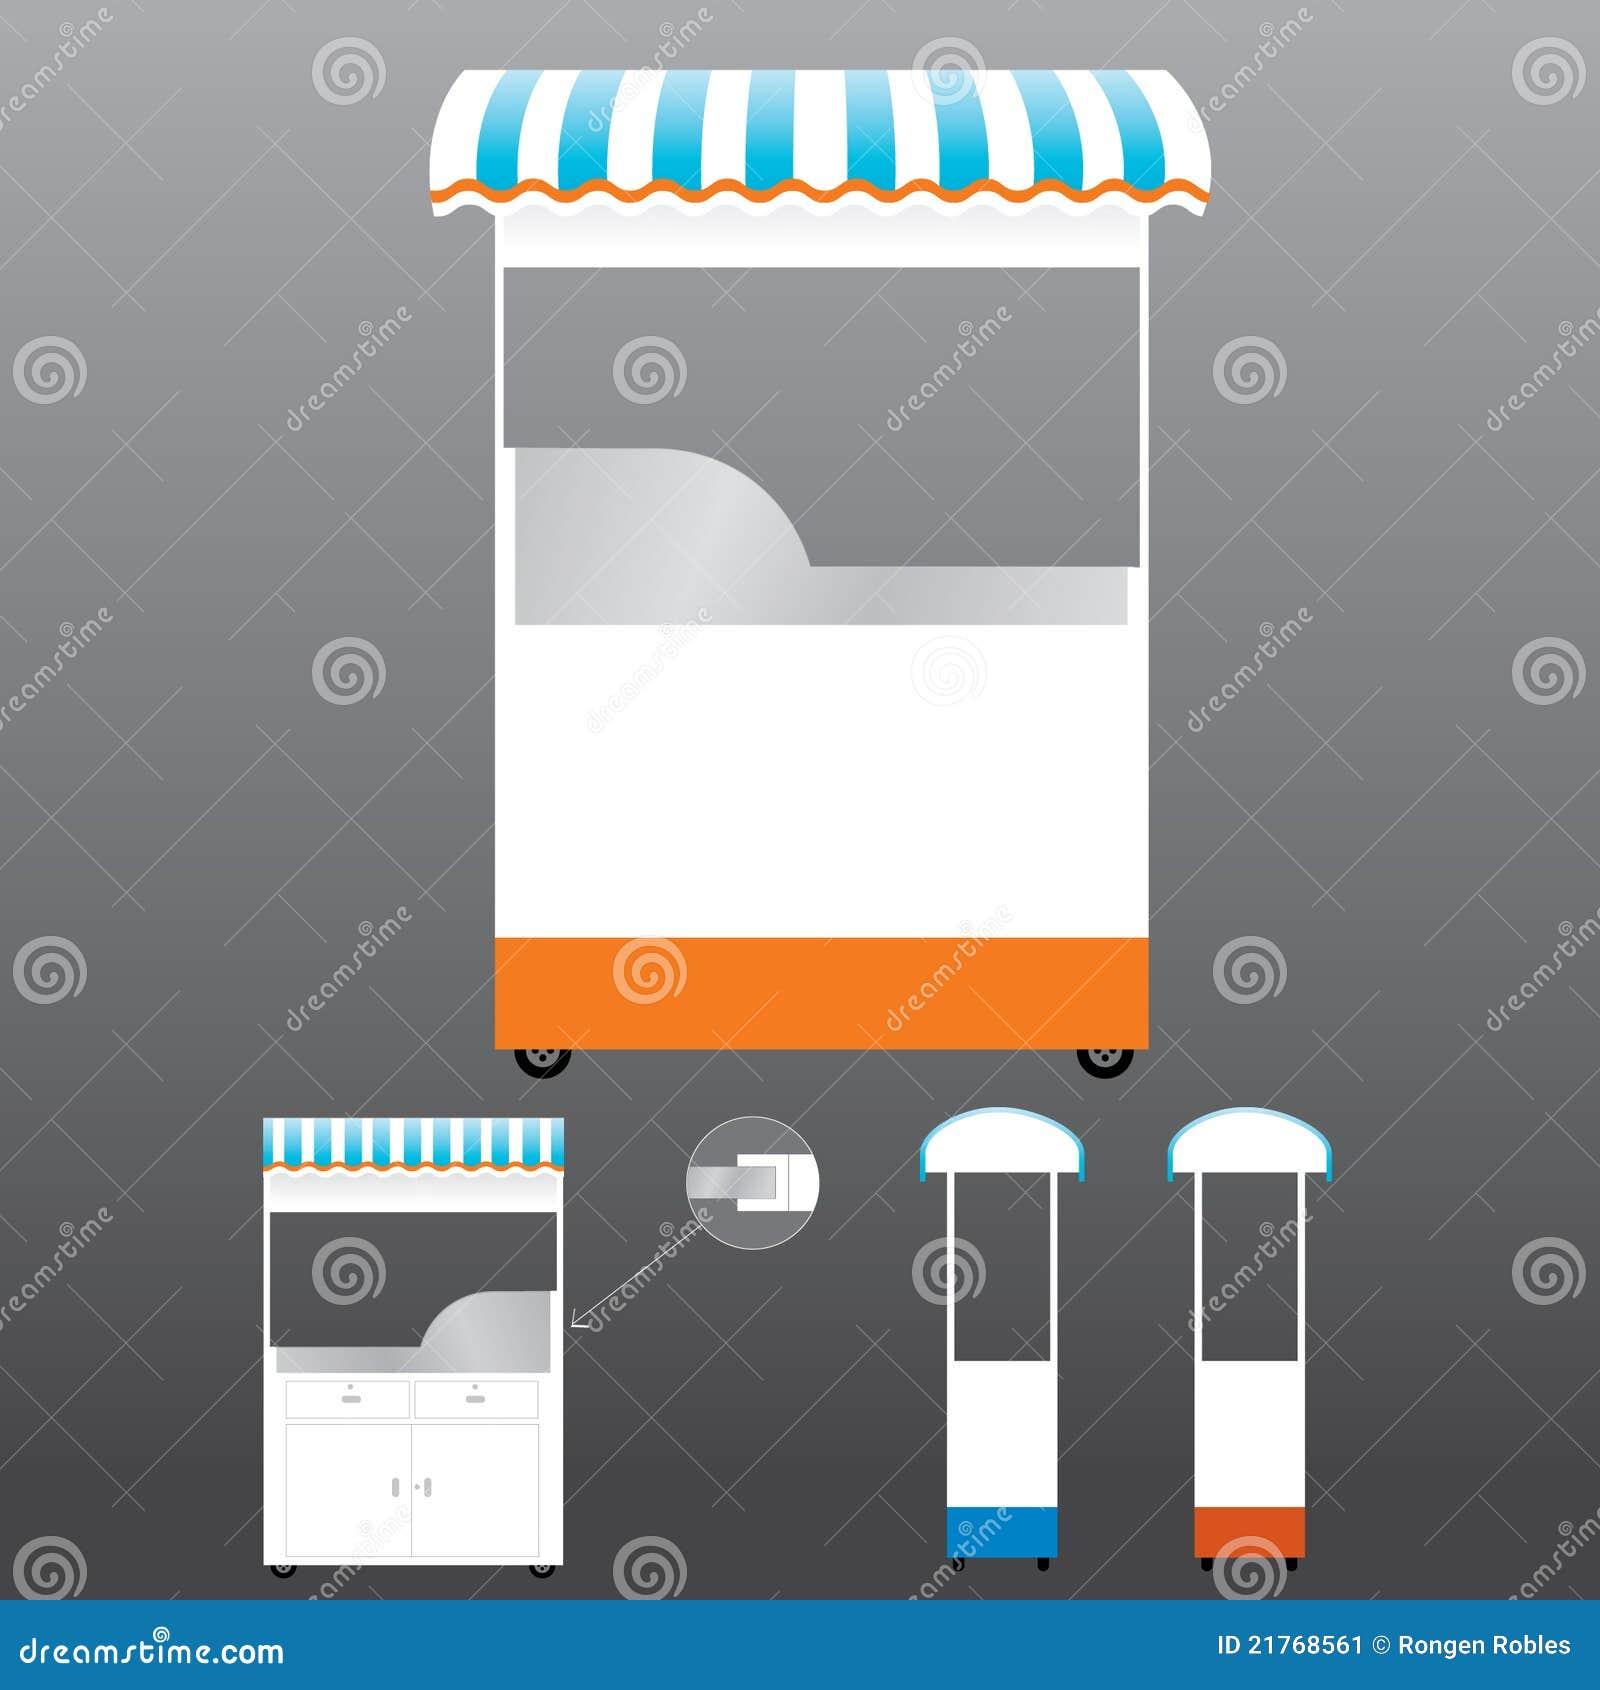 Food Kiosk Template stock illustration  Illustration of